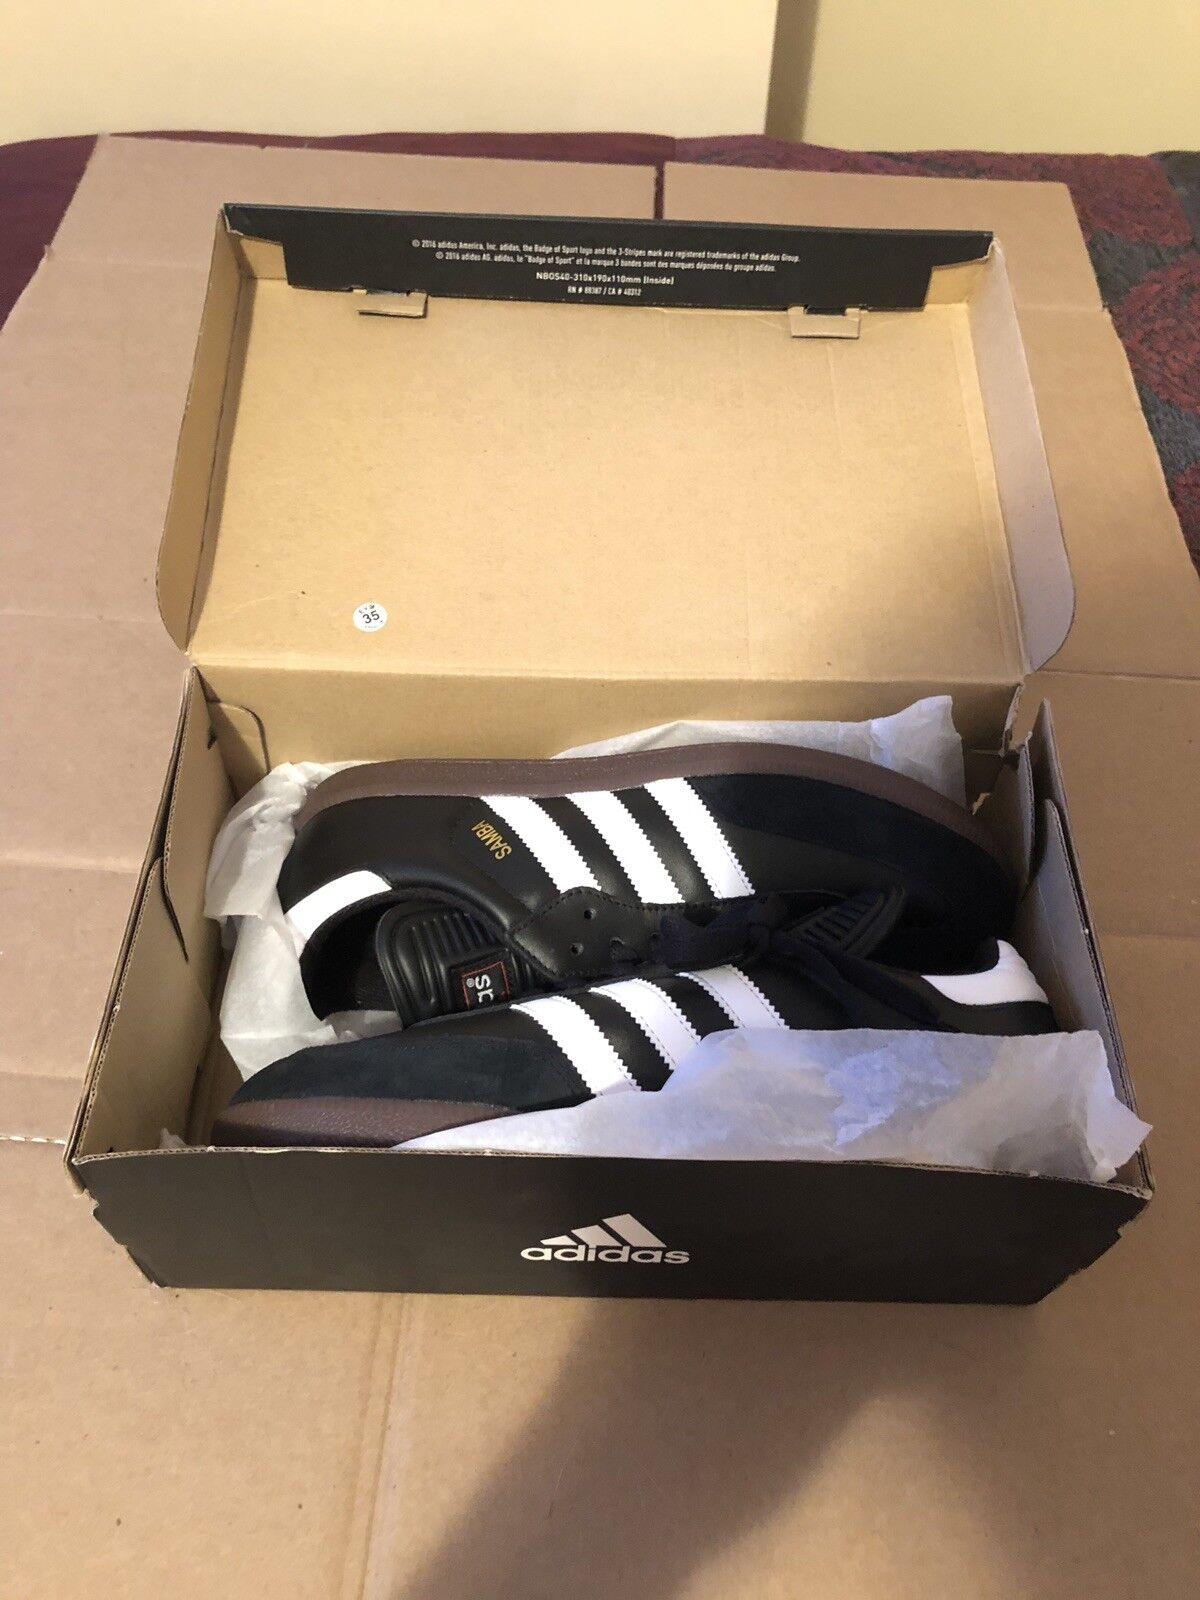 Men's Adidas Samba Classic Black Black Black Athletic Indoor Soccer shoes 034563 Sz 8.5 227dce